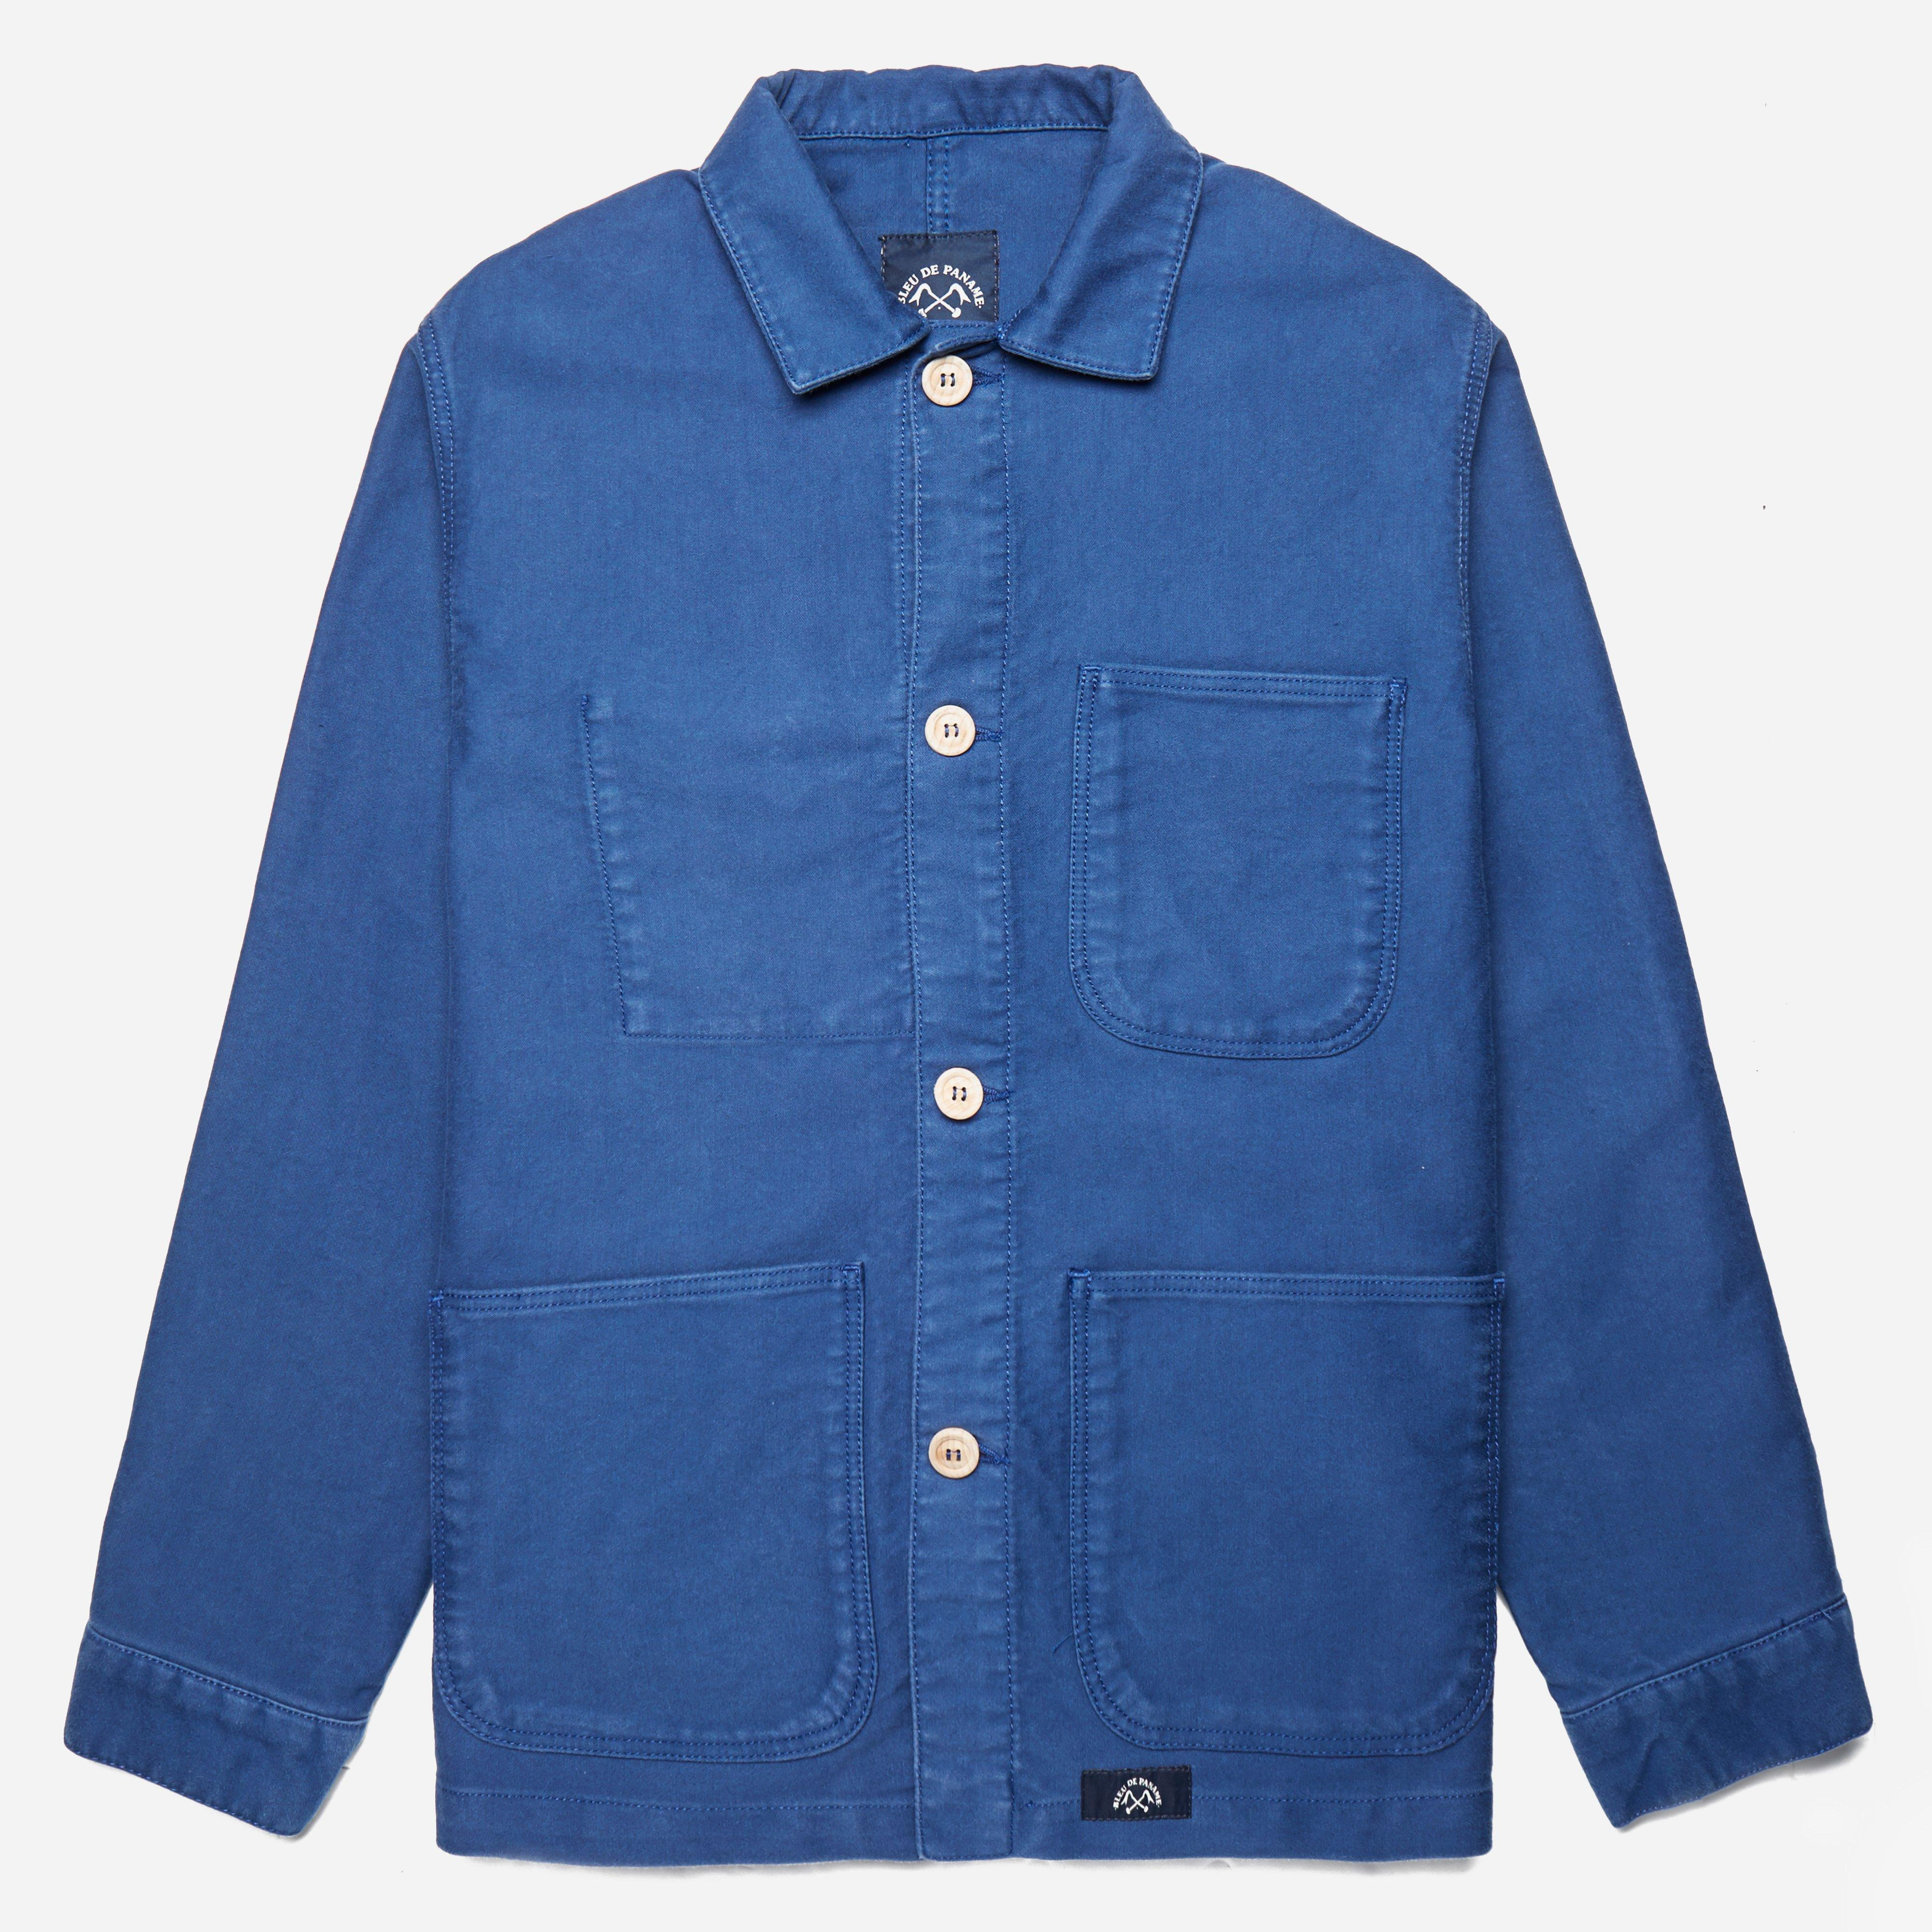 Bleu De Paname Veste De Comptoir